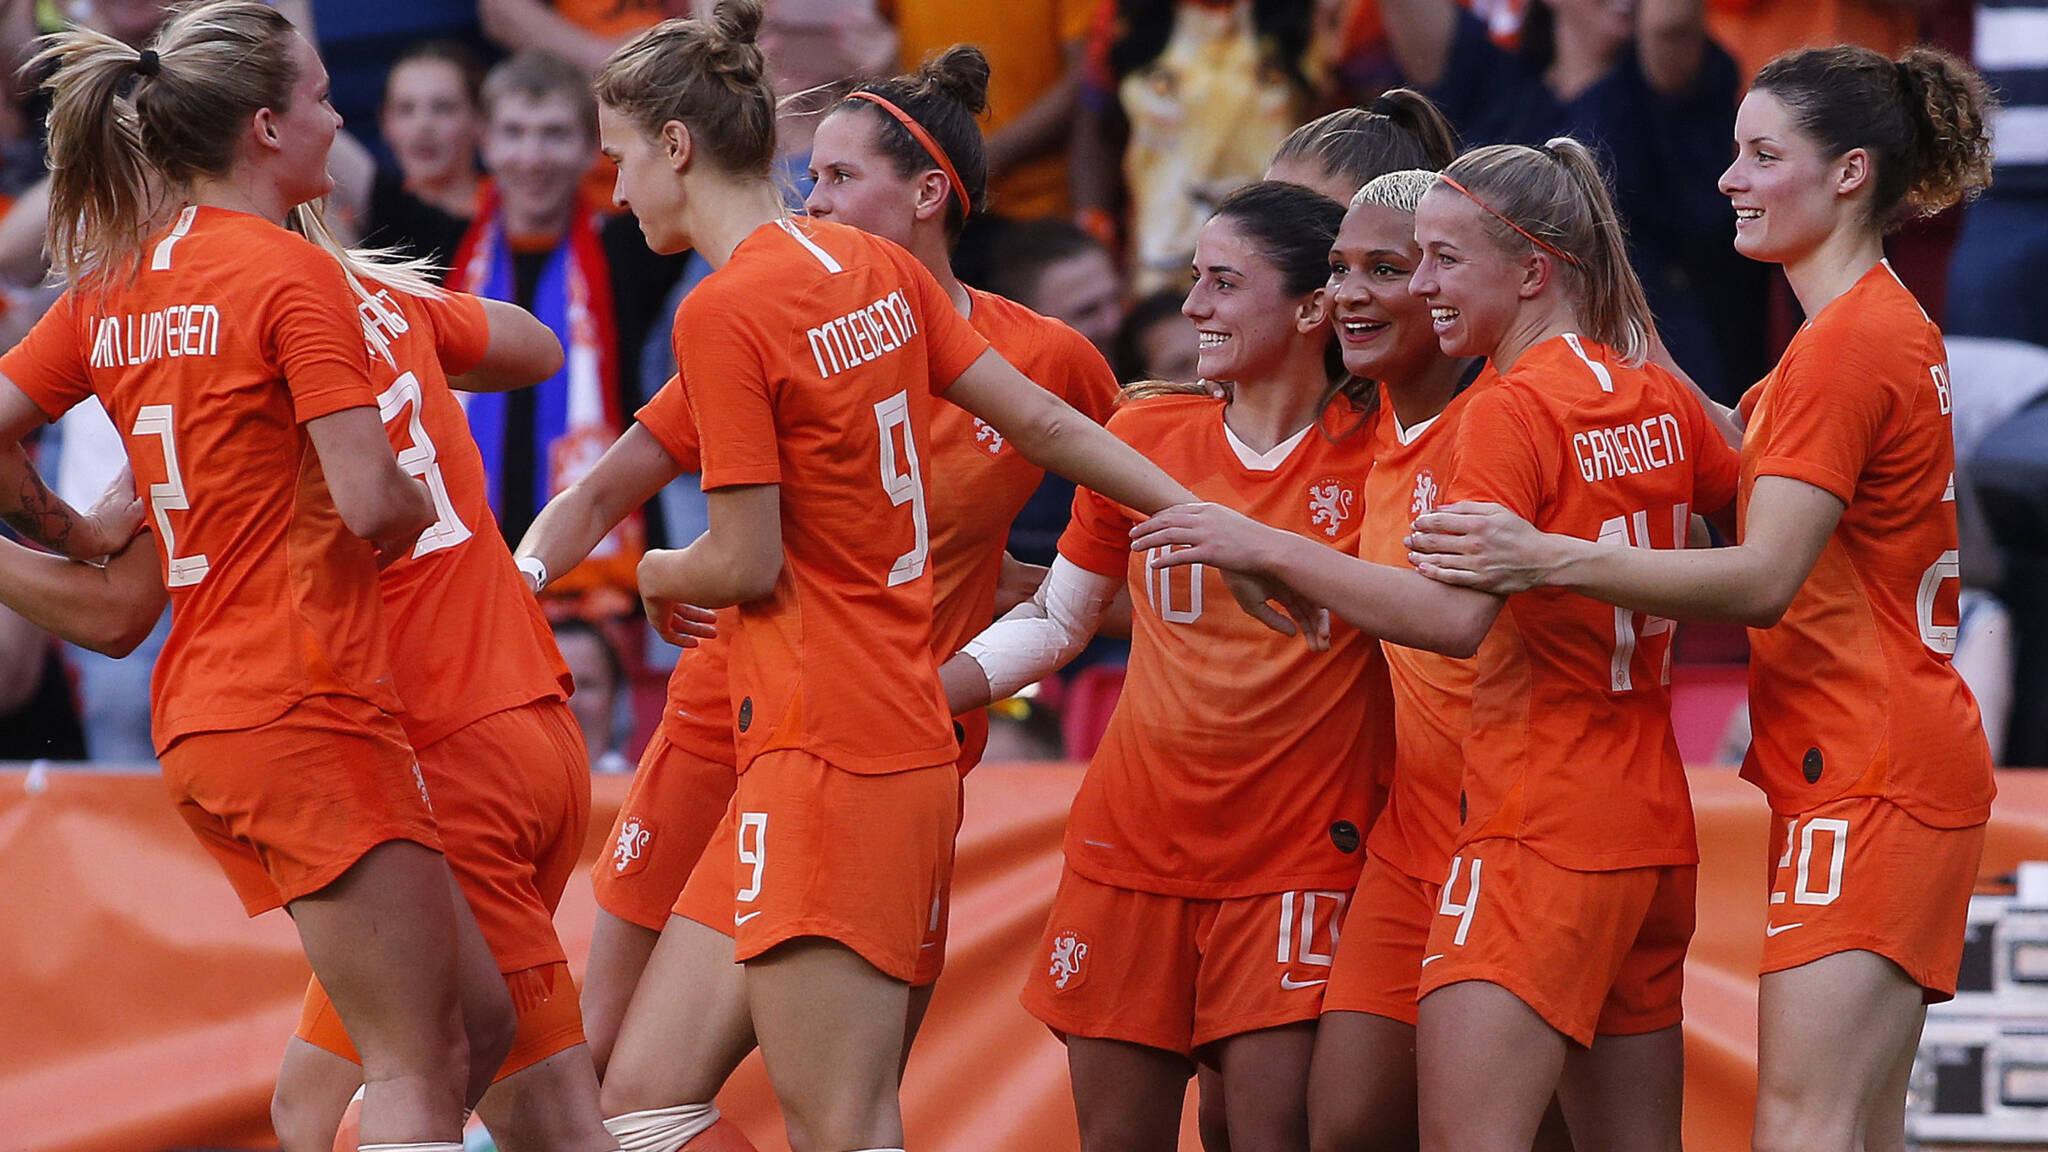 vrouwenvoetbal levert speelsters steeds meer op maar er